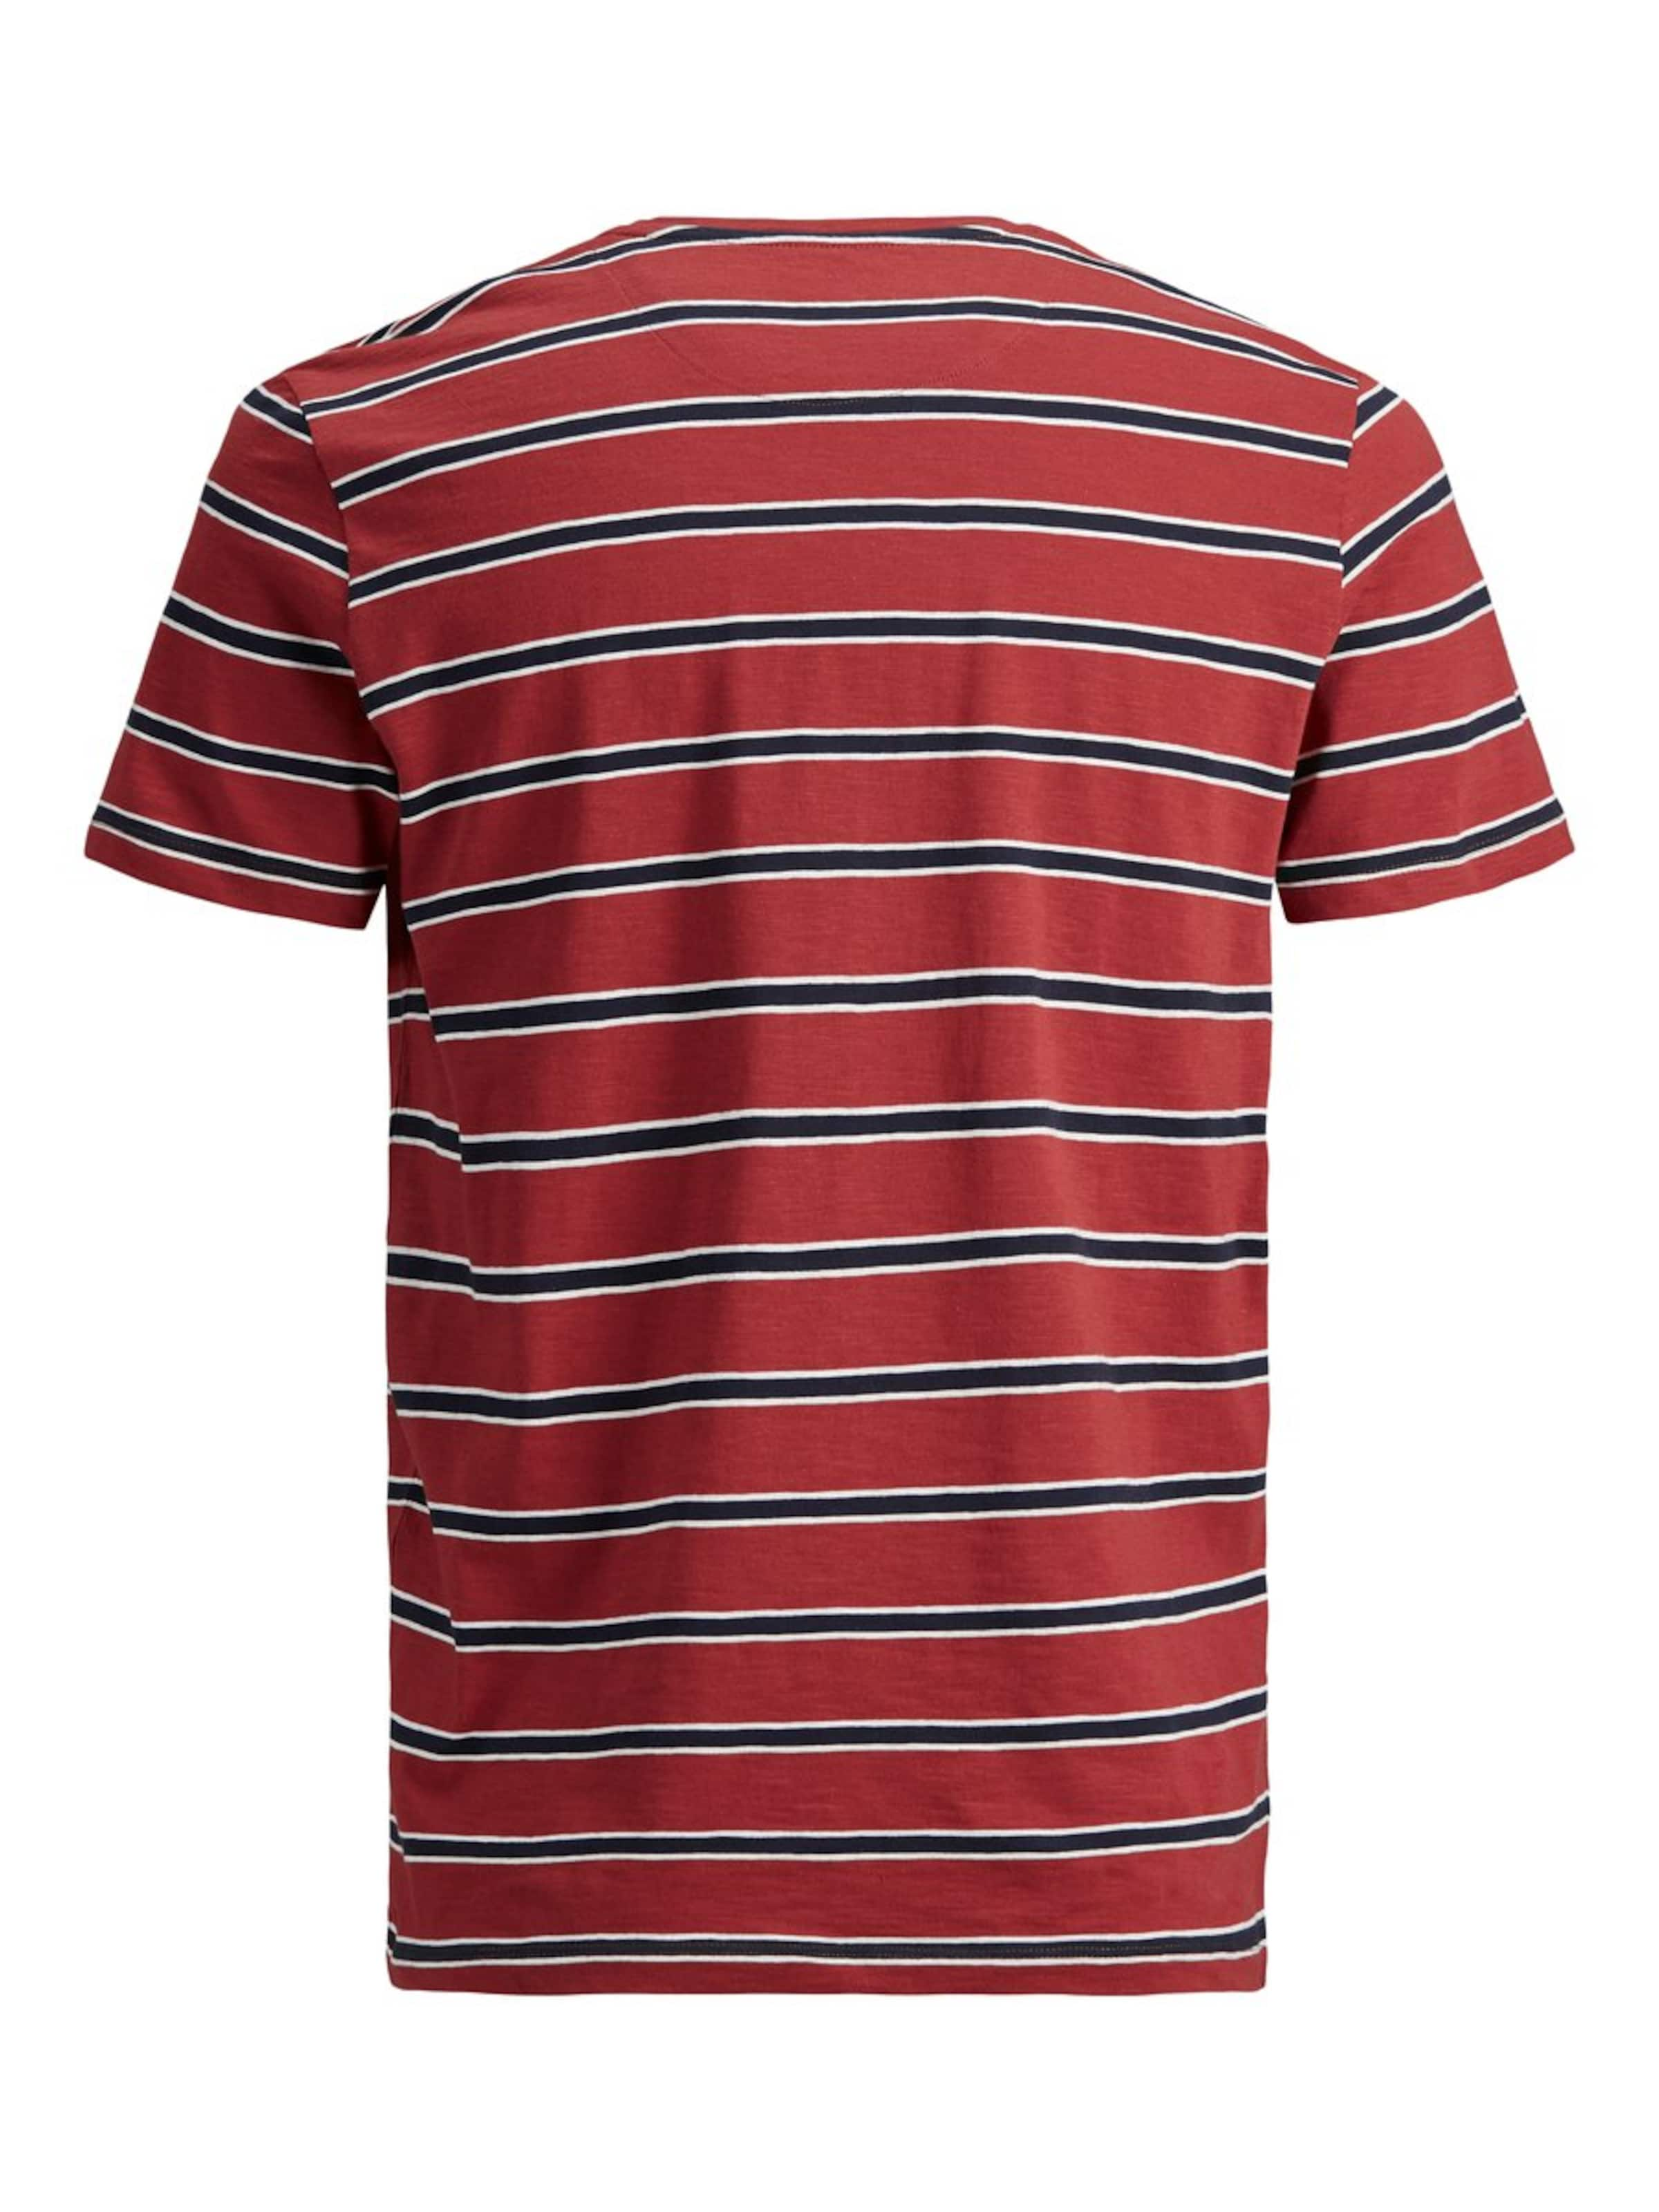 Jones In RotSchwarz shirt T Weiß Jackamp; PnOk0w